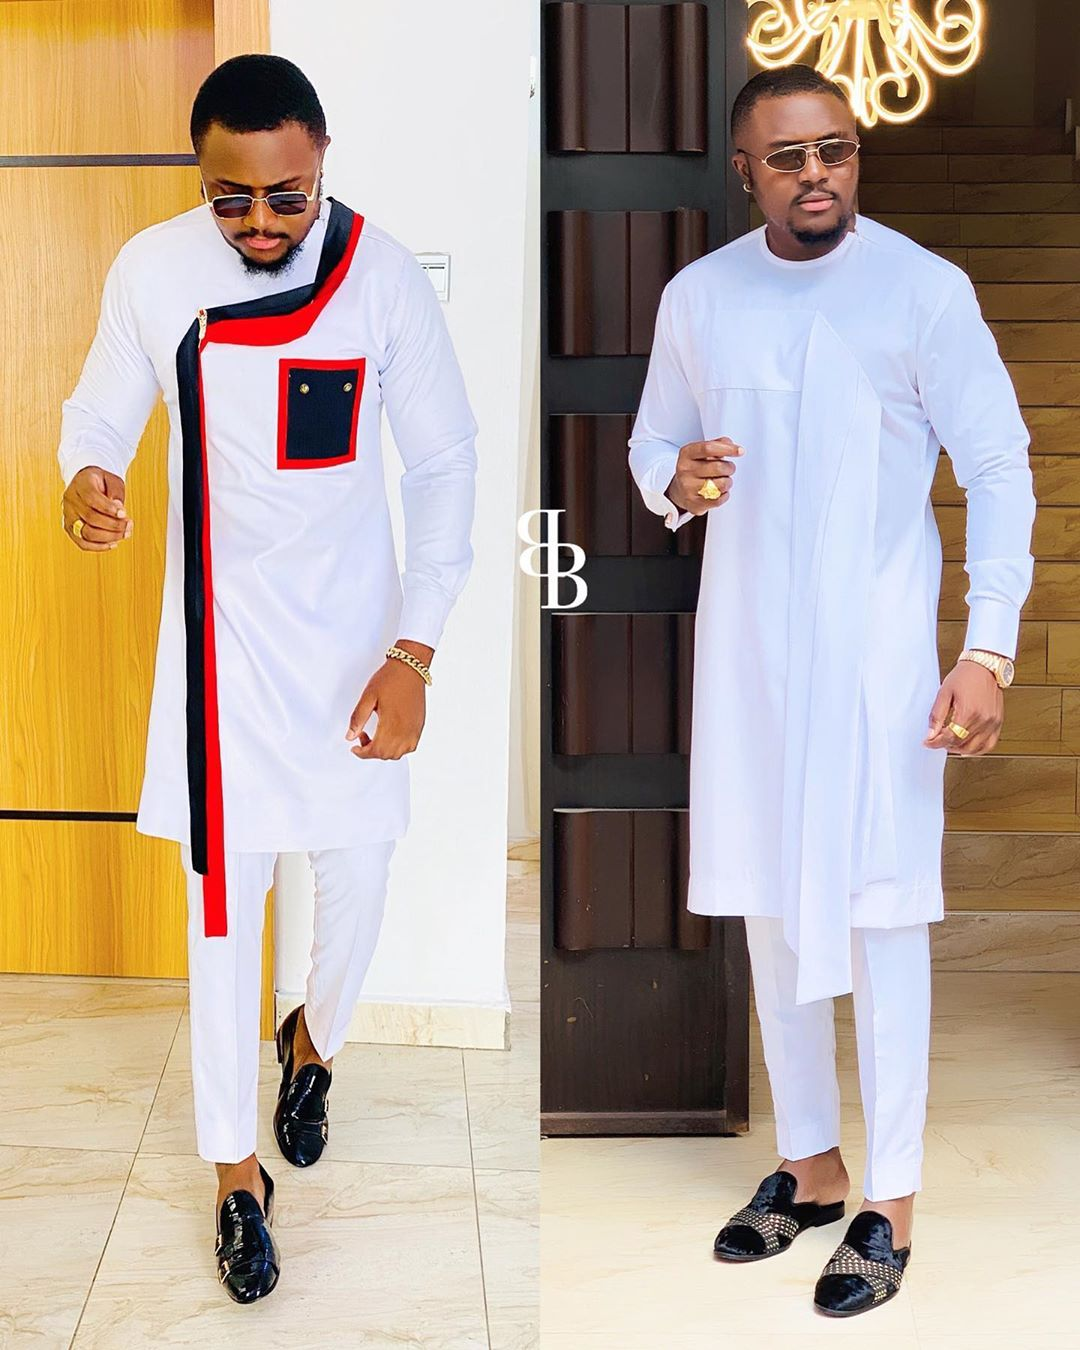 Men's Corner: Wardrobe Worthy Styles For Real Men.